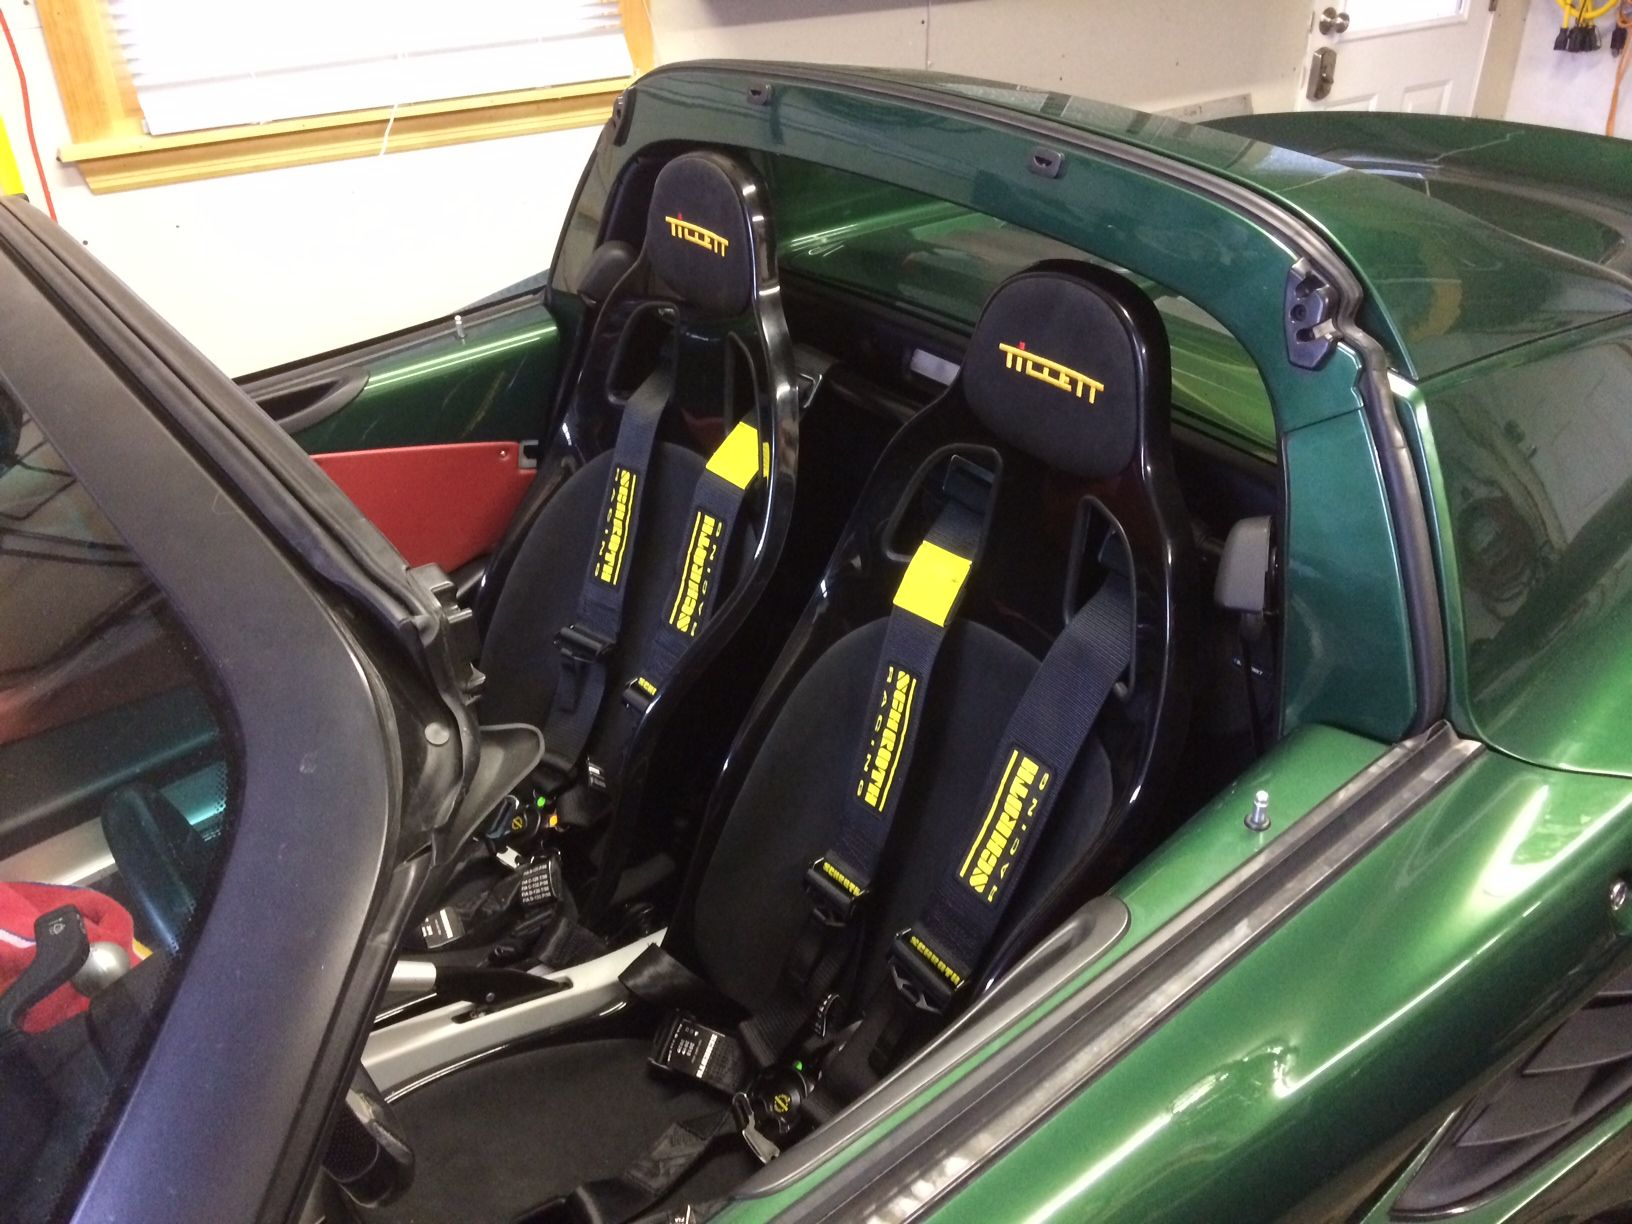 British racing green lotus elise with tillett b5 seats installed british racing green lotus elise with tillett b5 seats installed using elise specific brackets vanachro Image collections